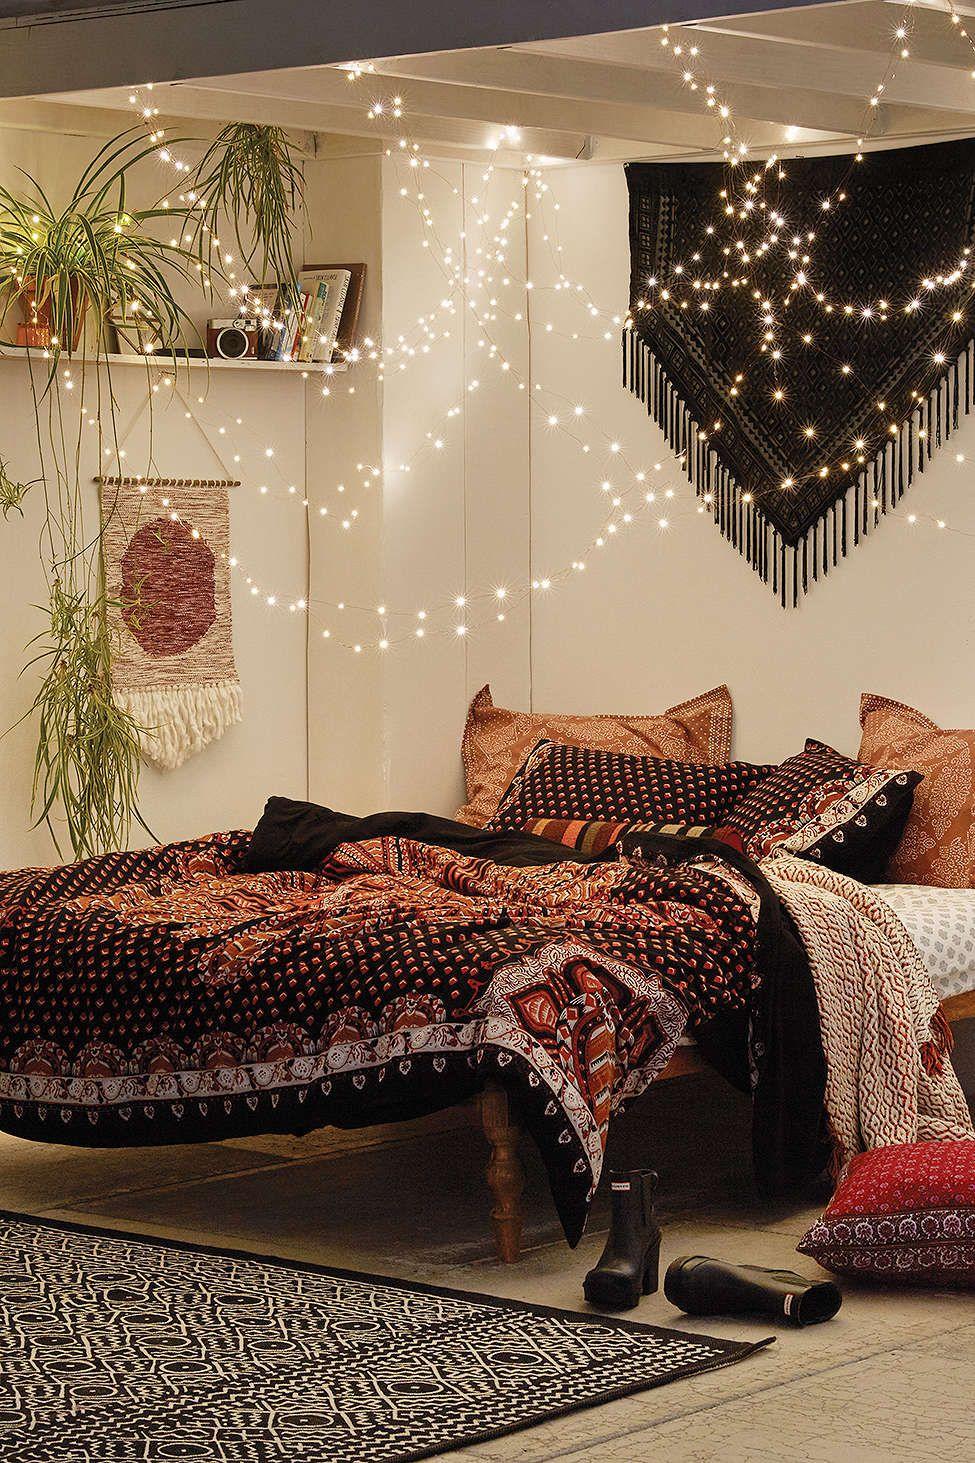 Hipster bedroom lights - Dreamy Boho Bedroom Daily Dream Decor